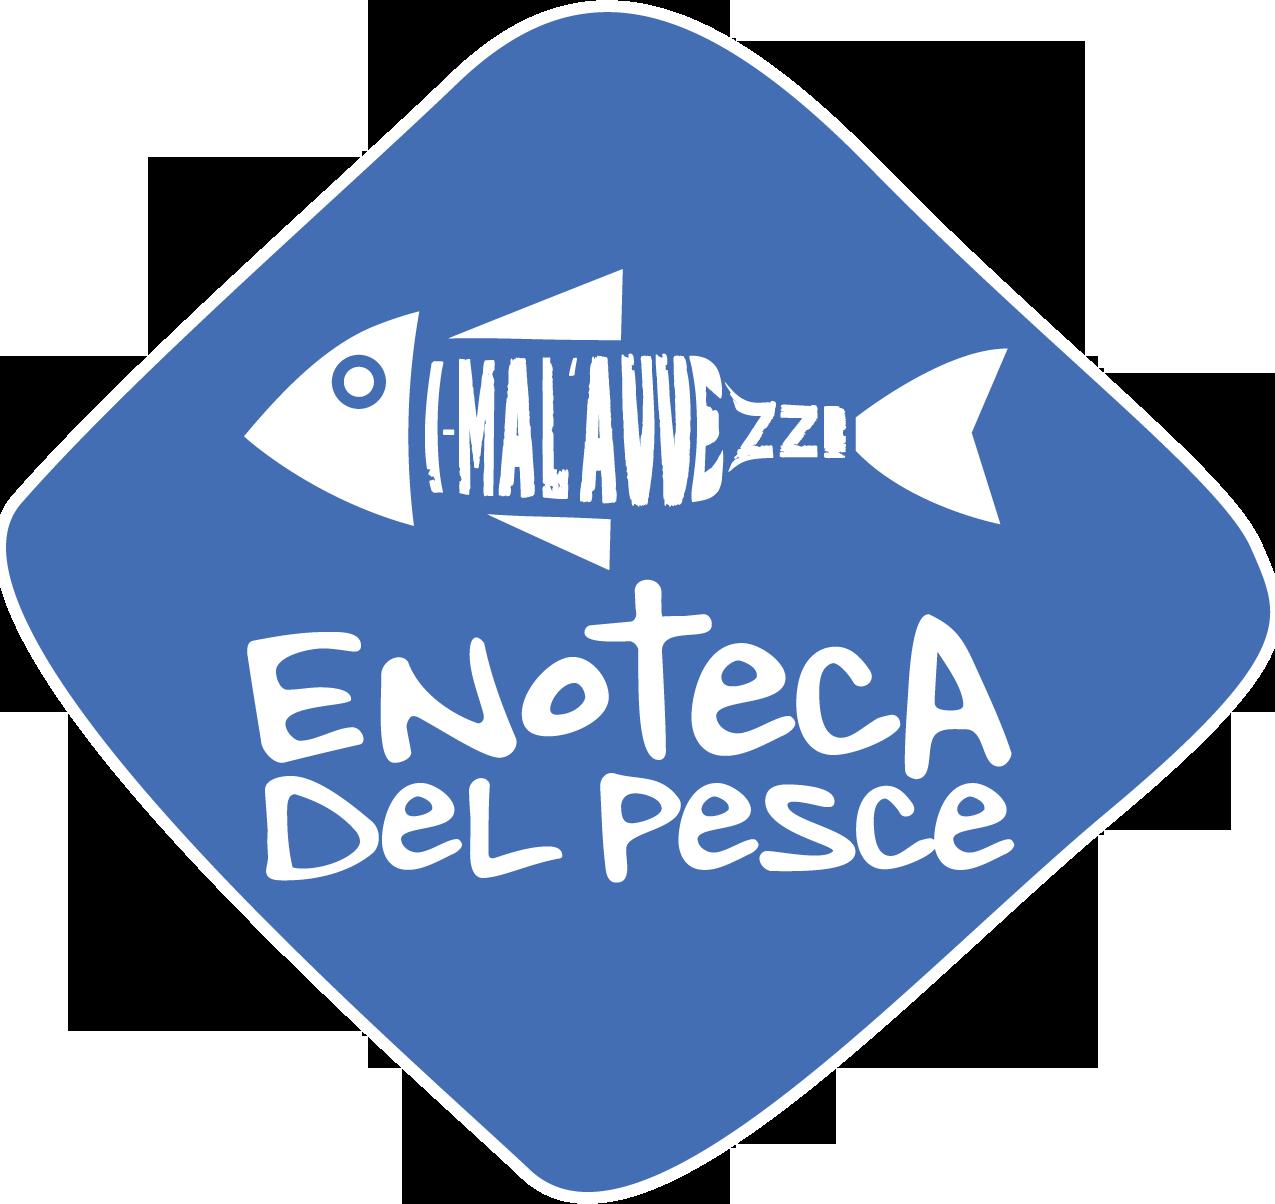 Ristorante Pesce Firenze - Enoteca del Pesce by I Mal'avvezzi